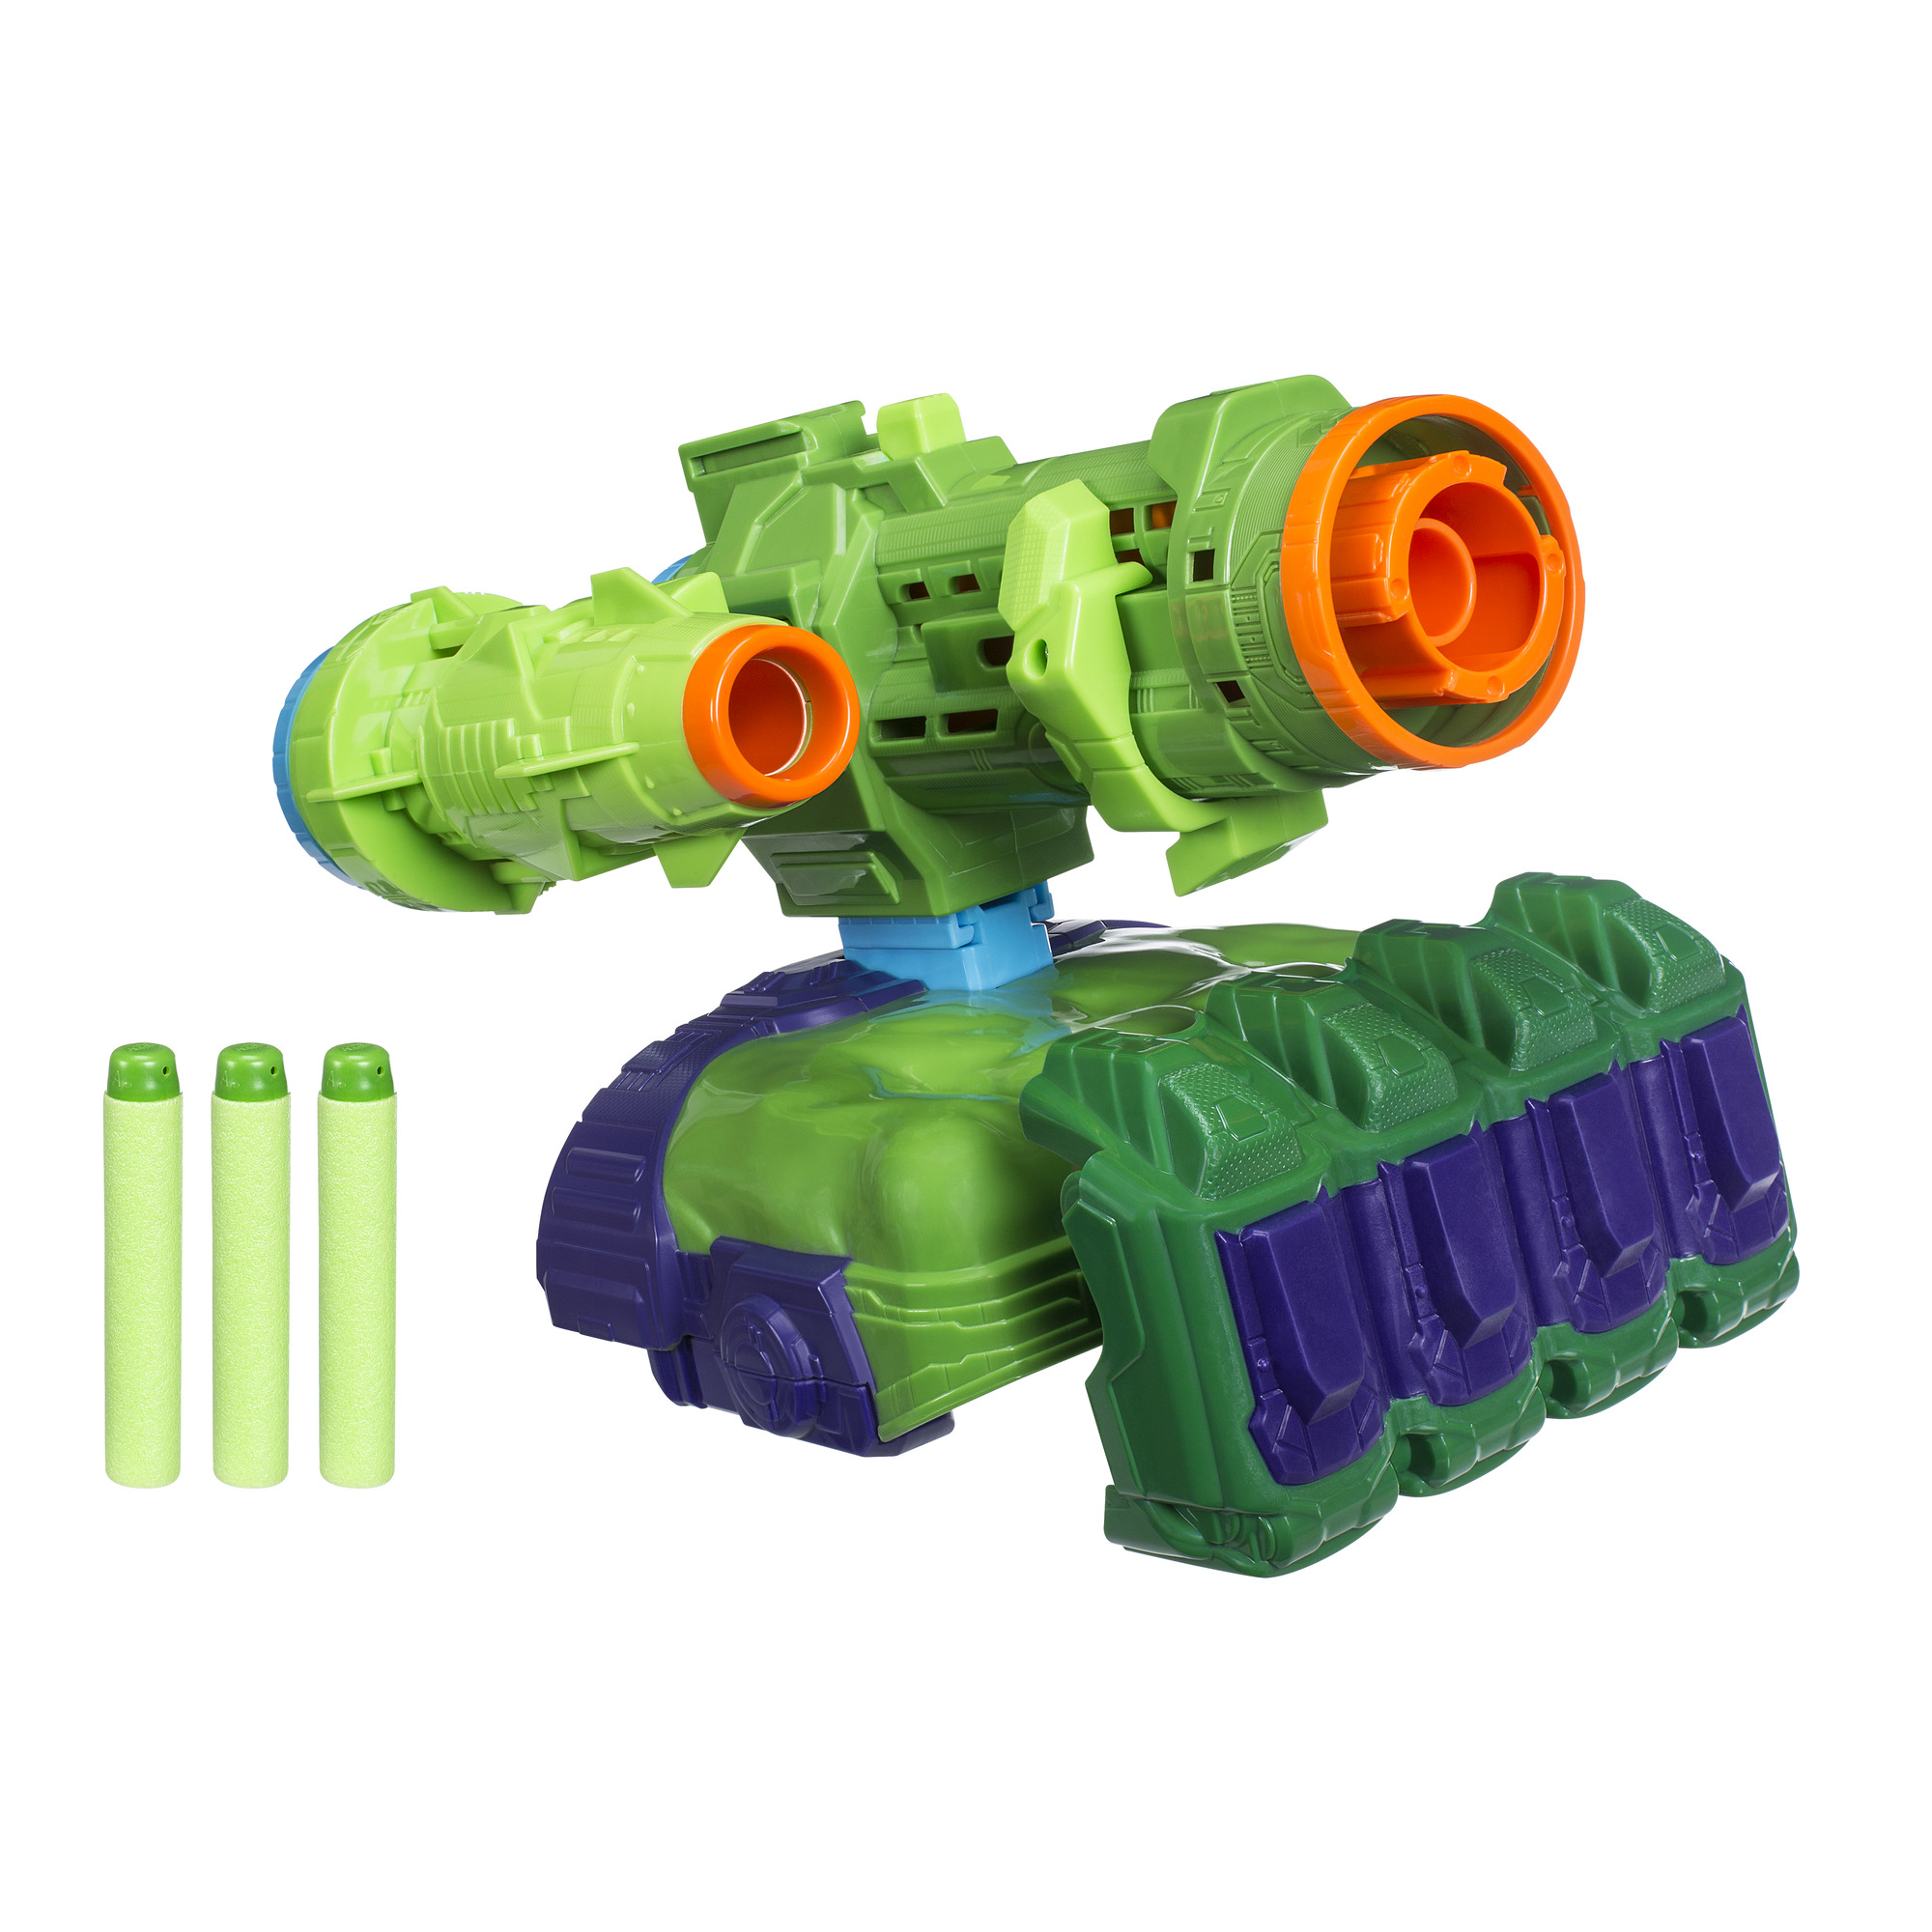 Marvel Avengers: Infinity War Nerf Hulk Assembler Gear by Hasbro